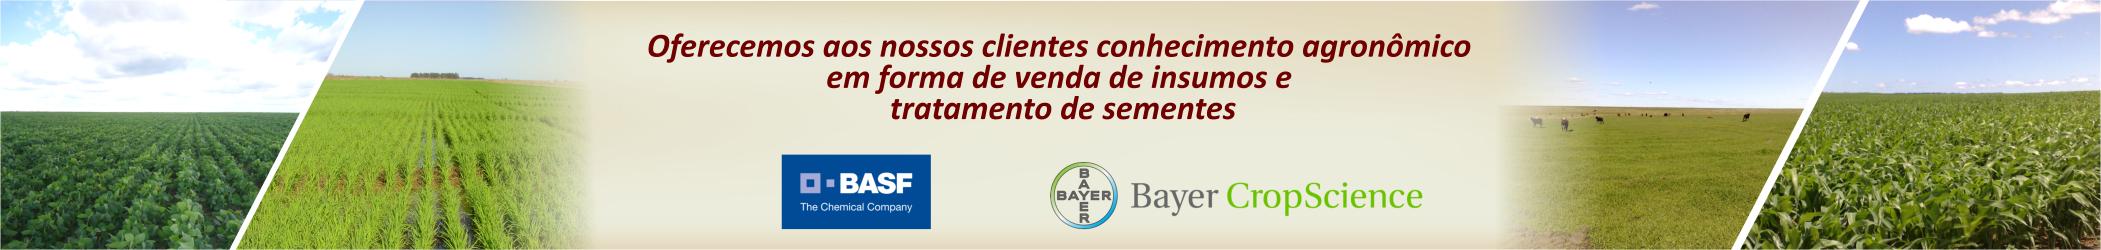 thedy_agro_insumos_basf_bayer